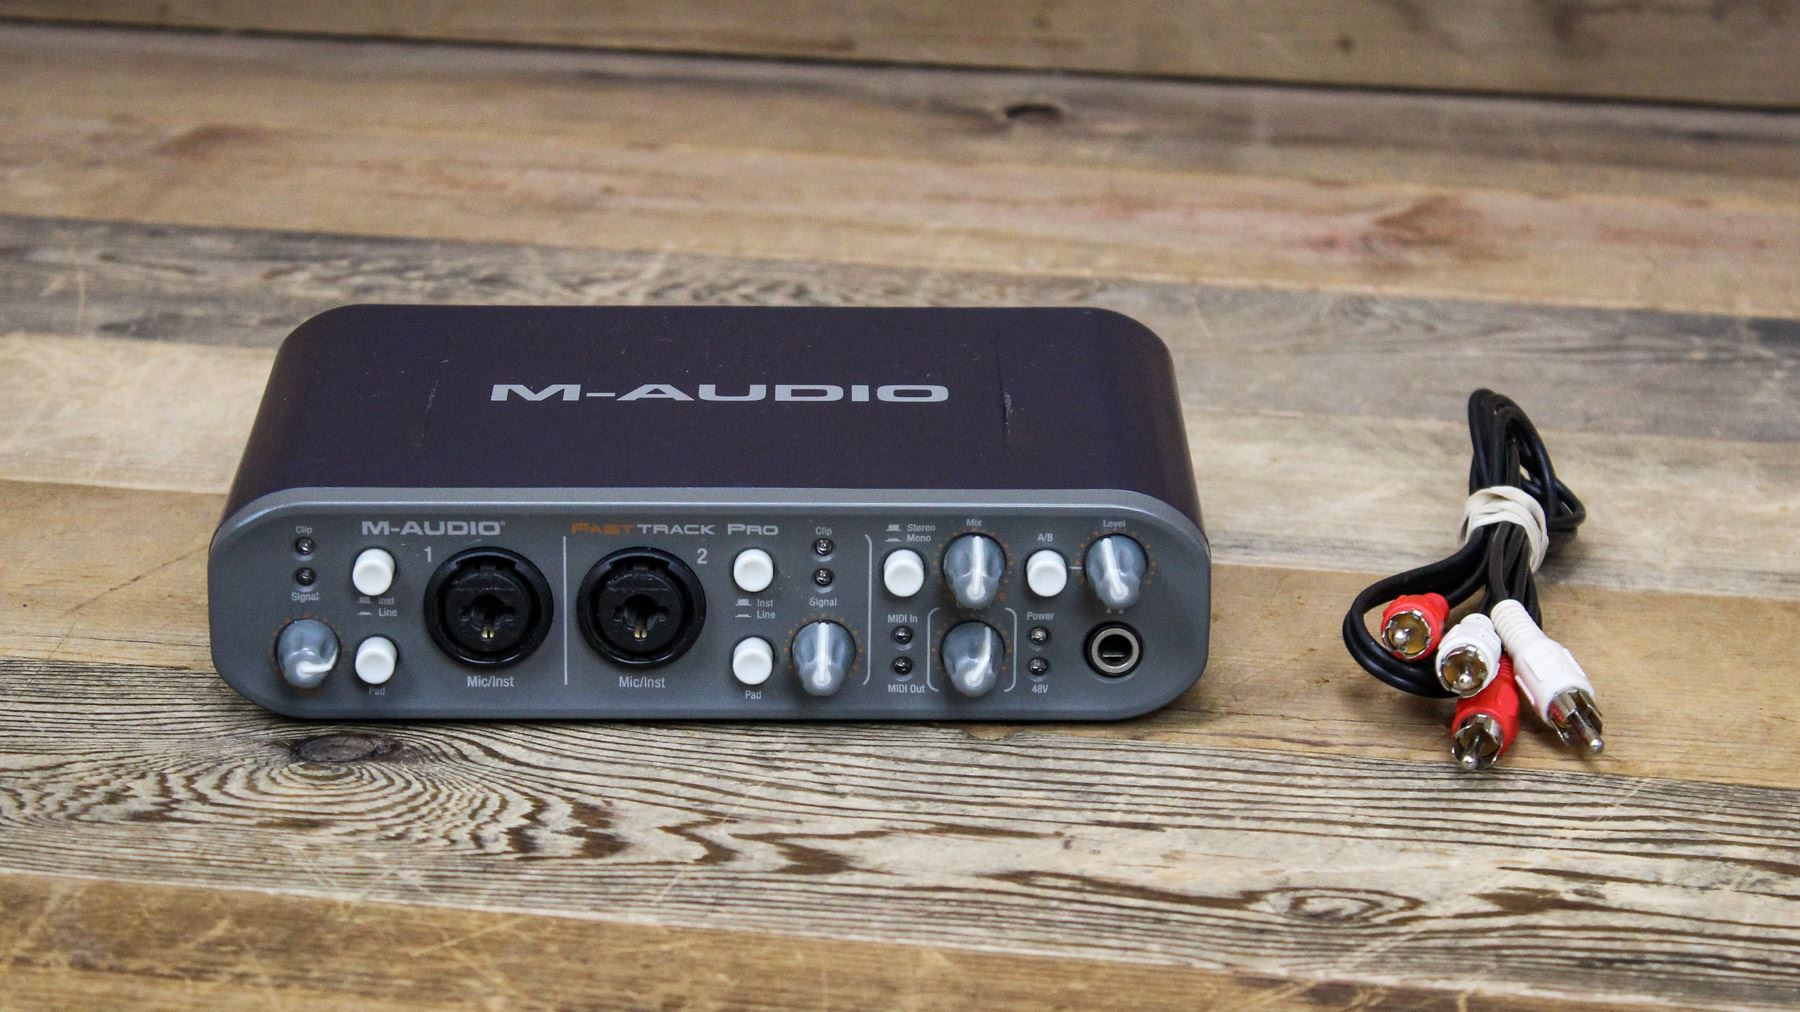 Driver track asio fast m-audio usb